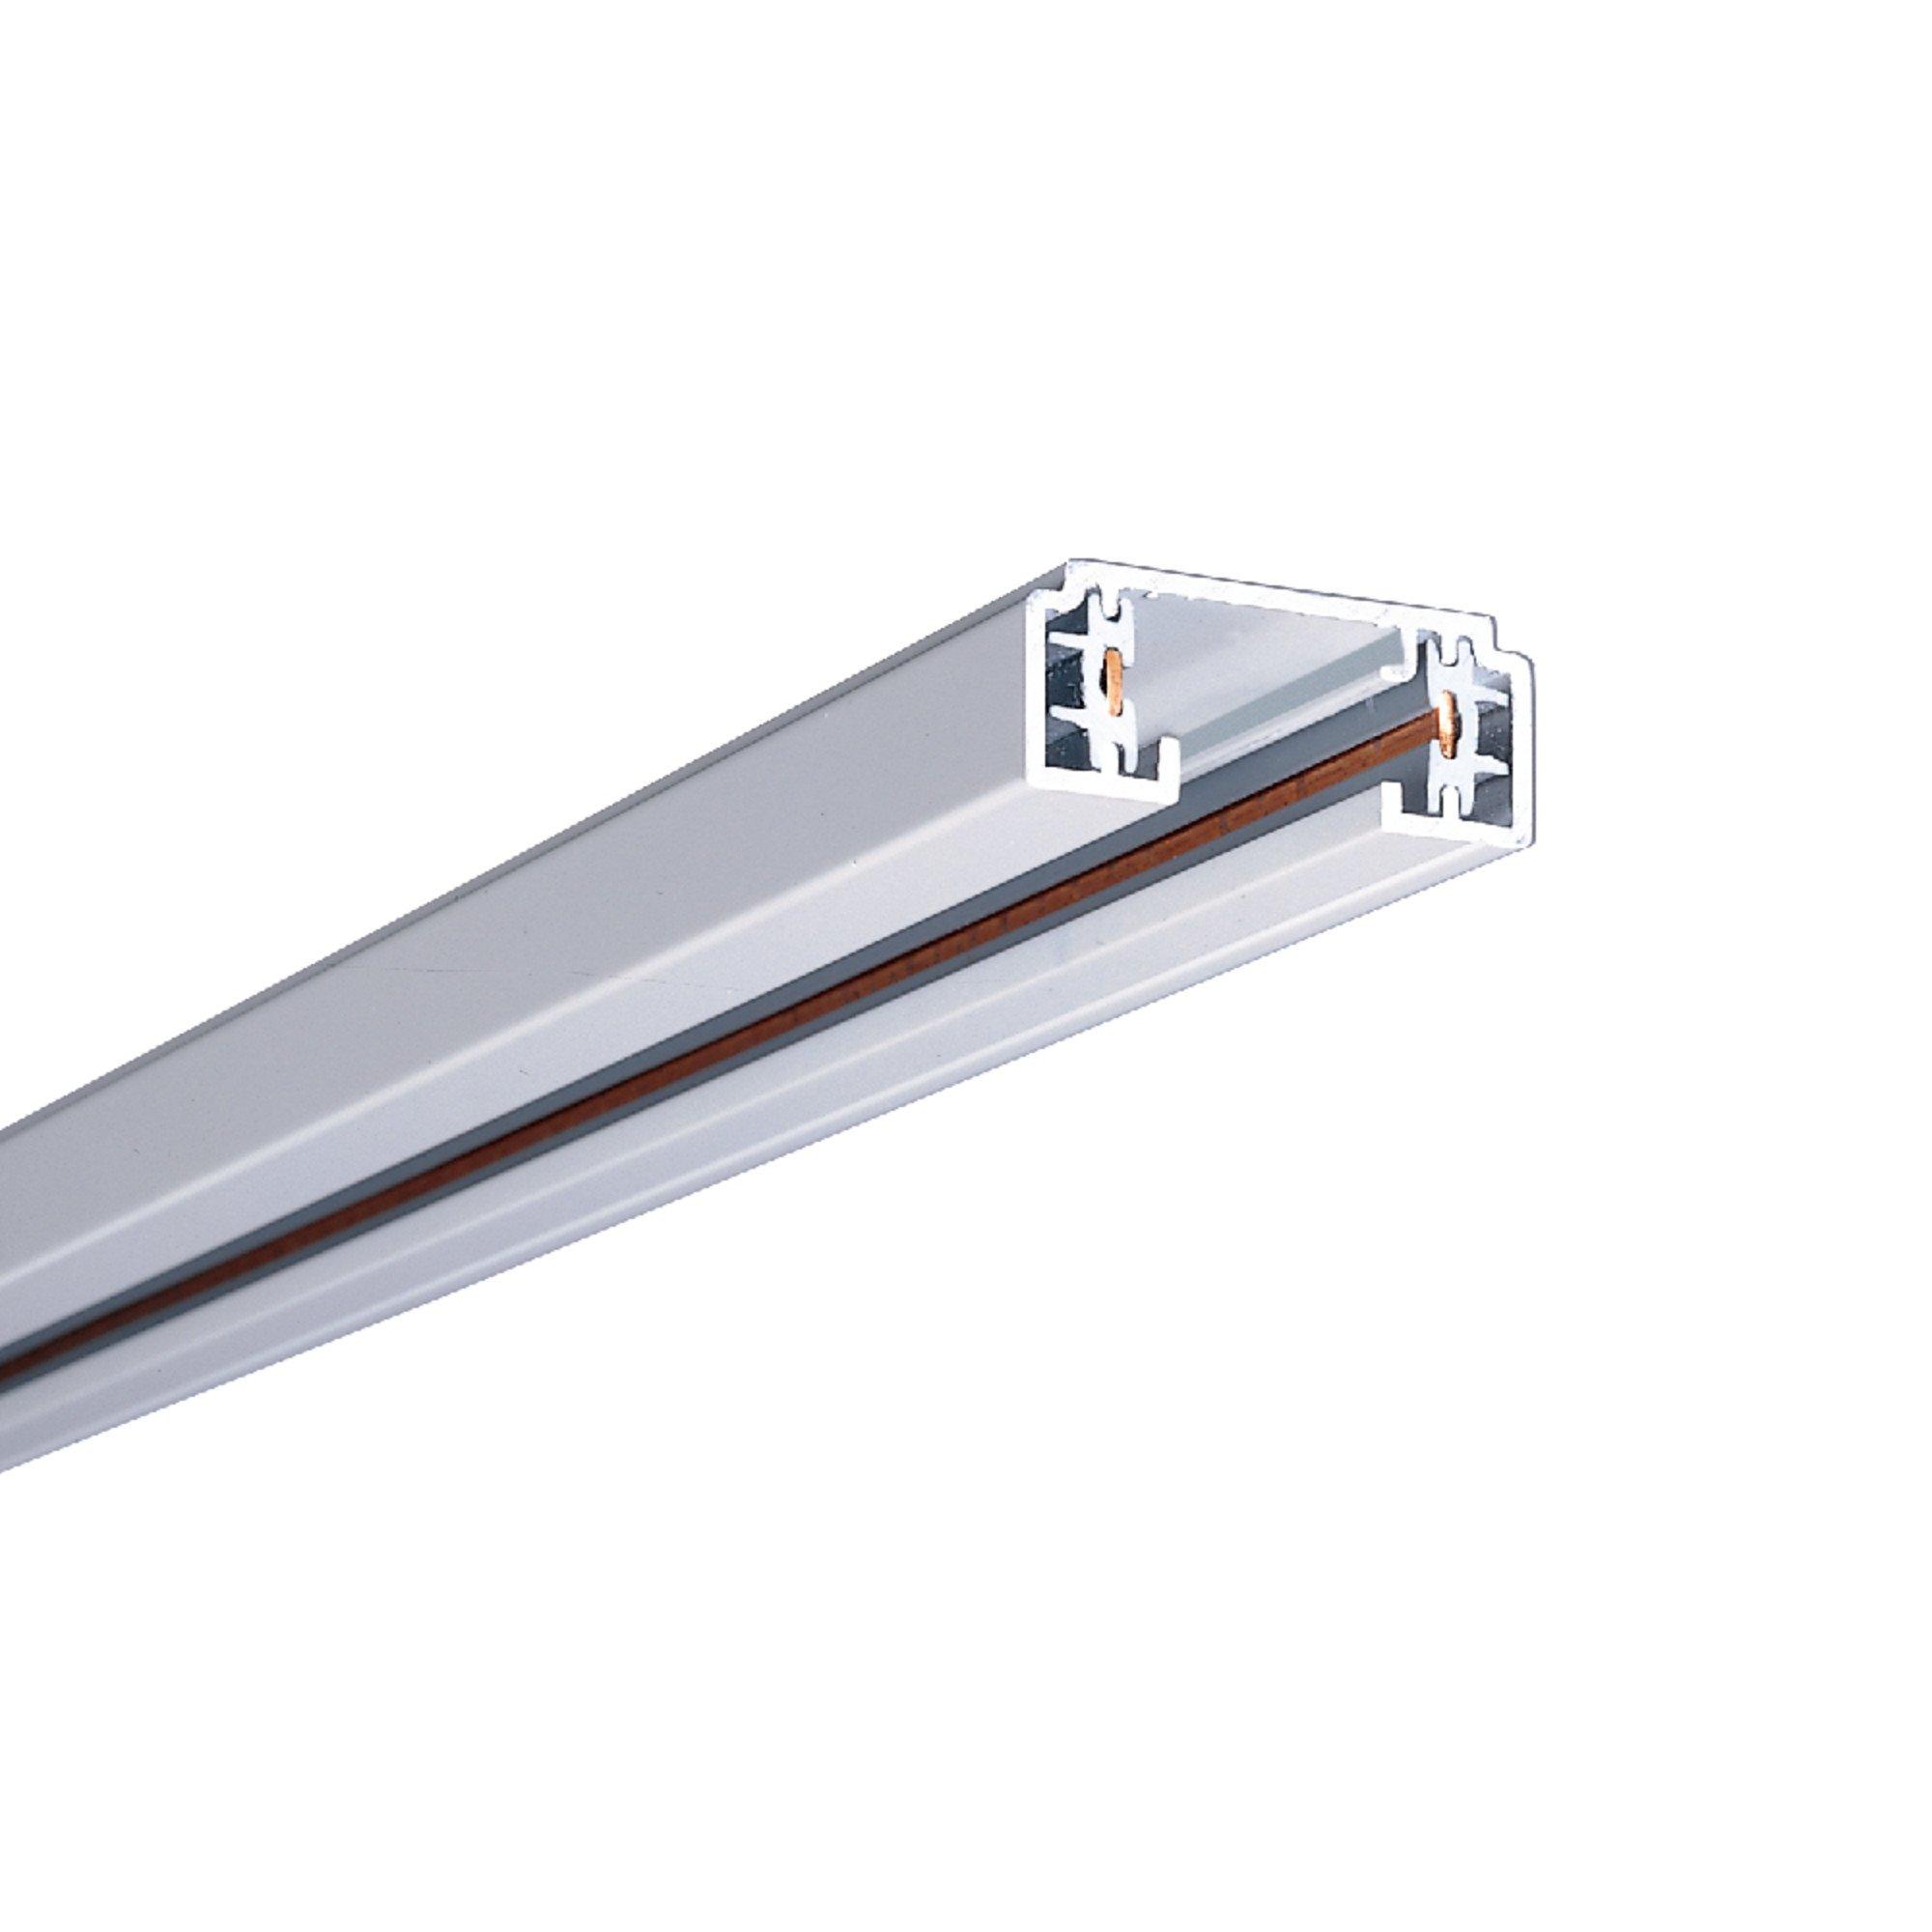 Halo Lazer Lighting LZR000104P 4' 1 Circuit Track Light